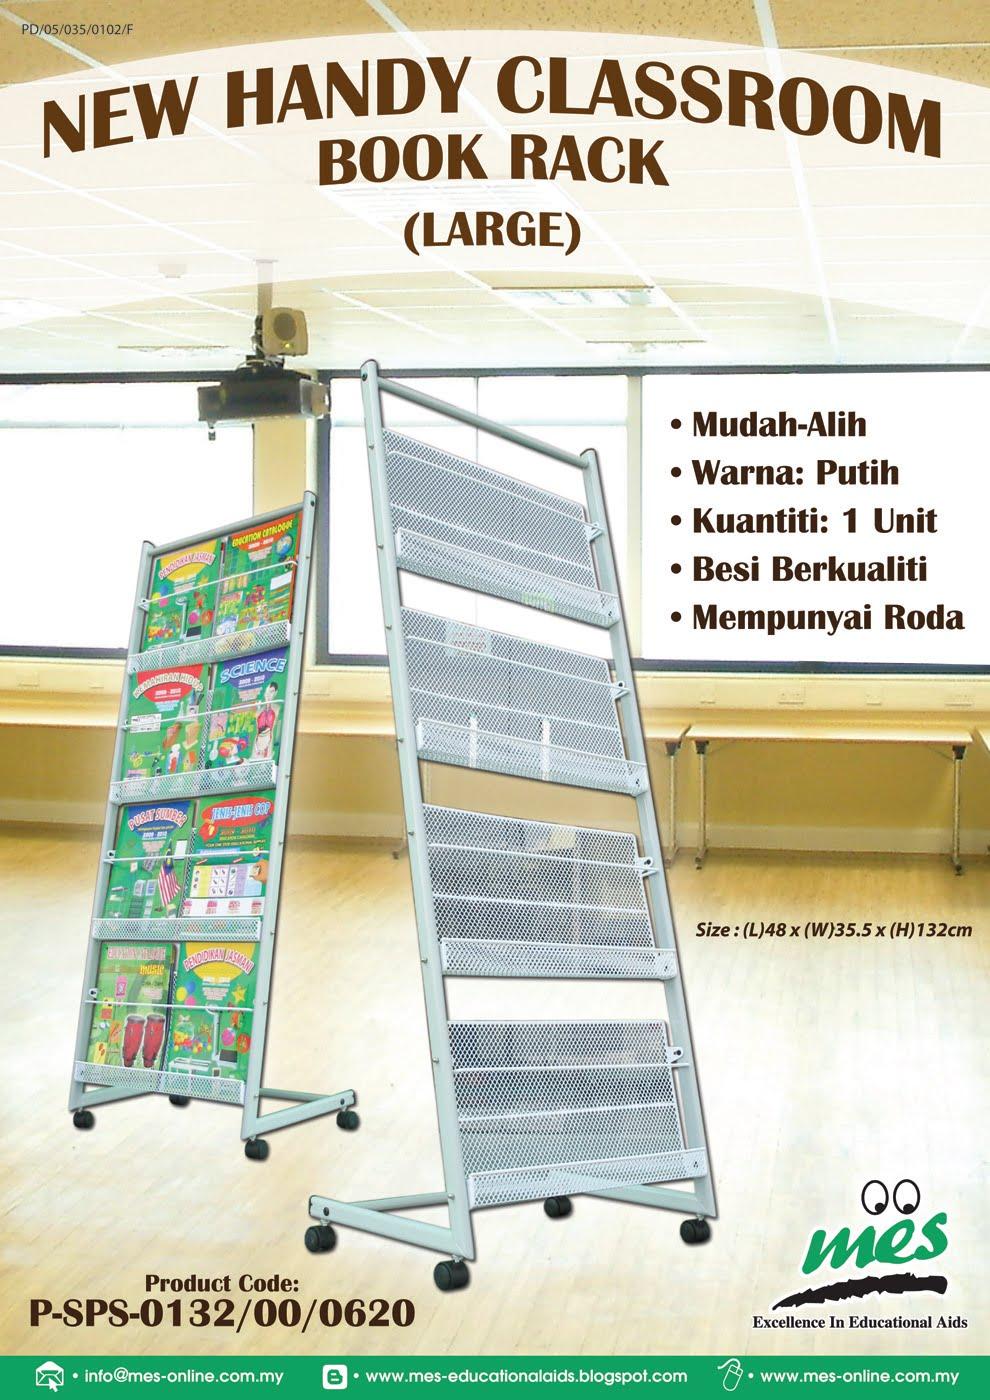 Modular Classroom Moving ~ Makmur educational supplies sdn bhd new handy classroom